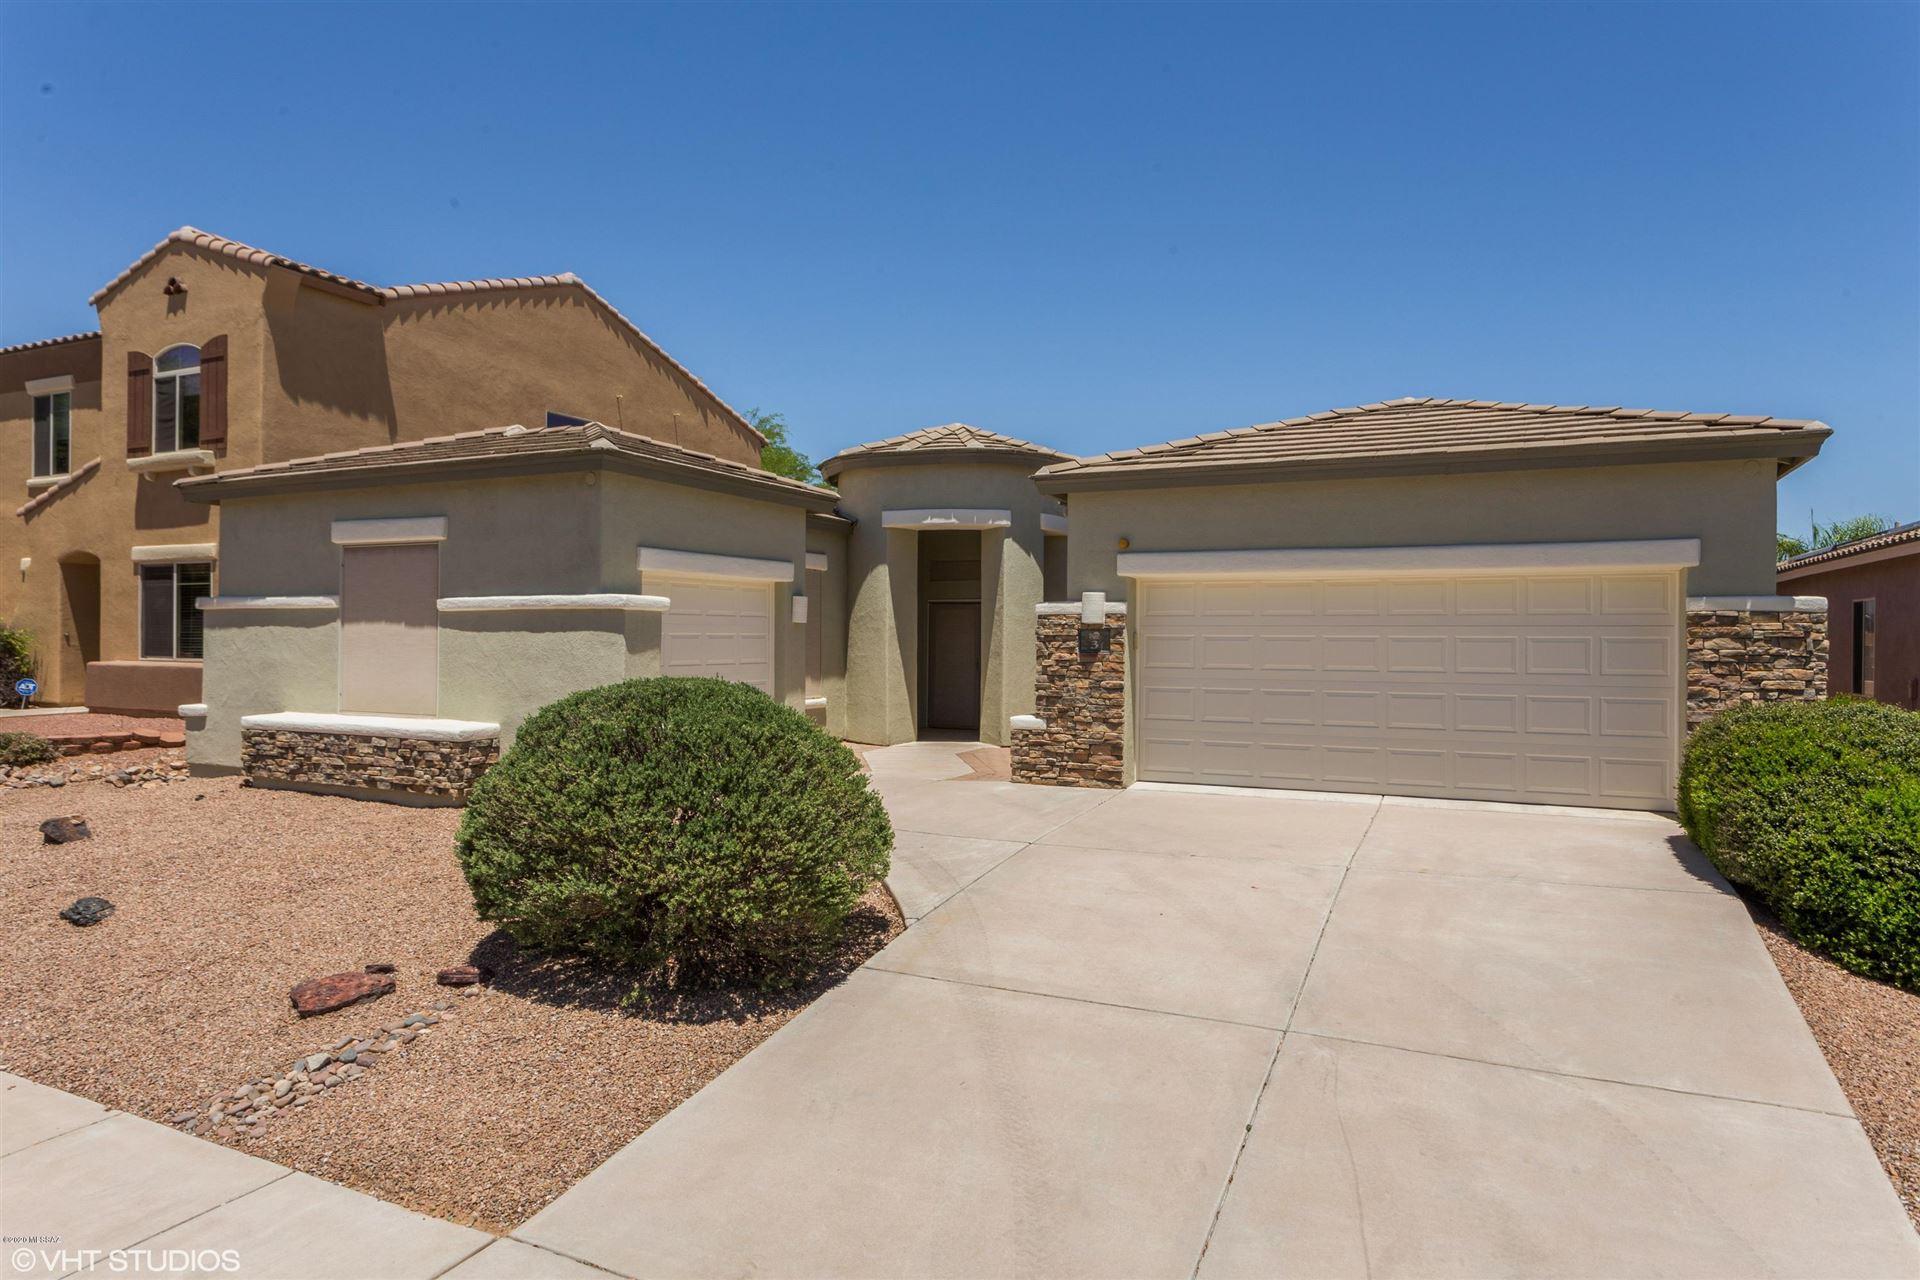 3 E Camino Rancho Cielo, Sahuarita, AZ 85629 - MLS#: 22013206